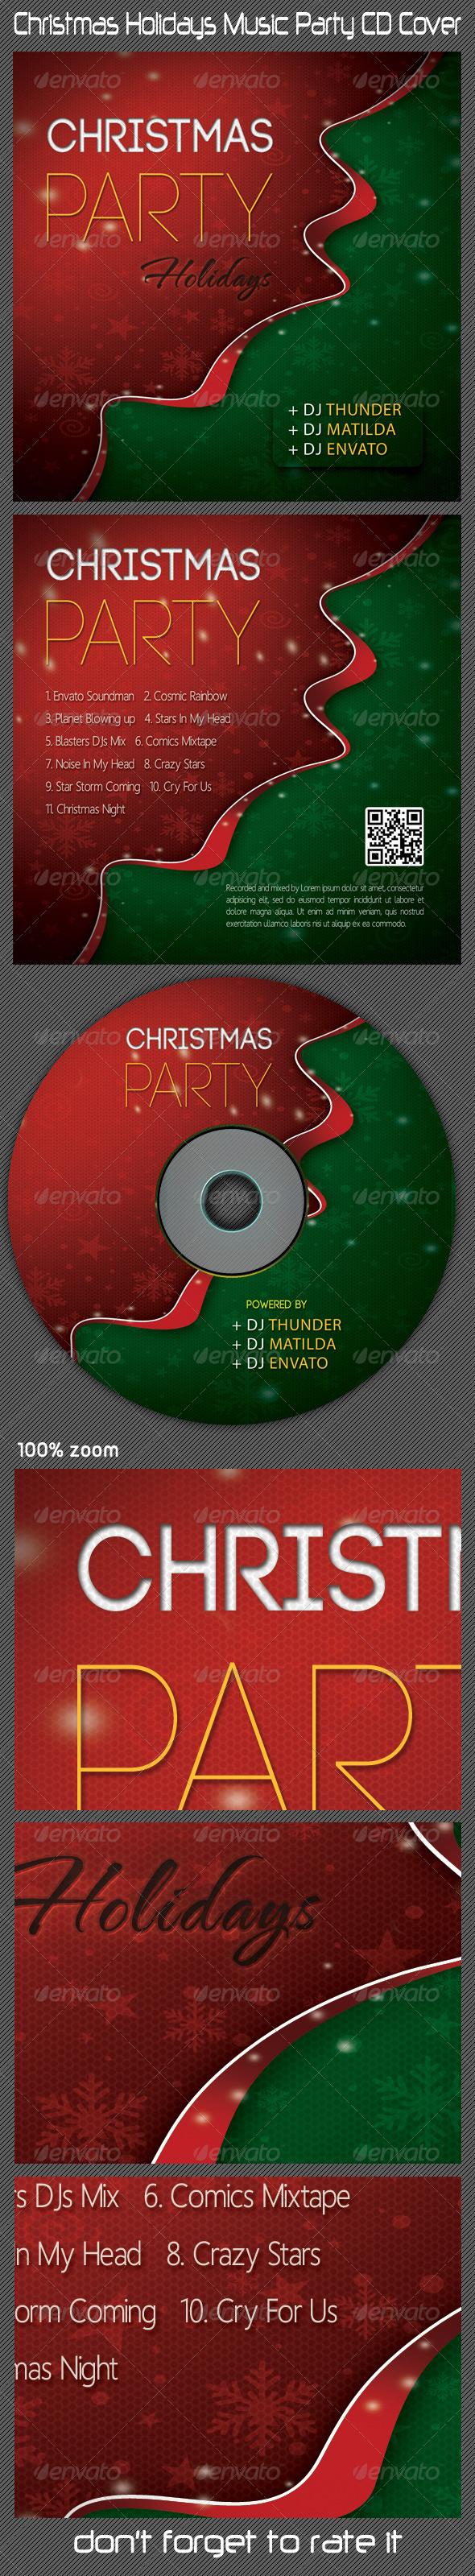 Christmas Holidays Music Party CD Cover - CD & DVD Artwork Print Templates